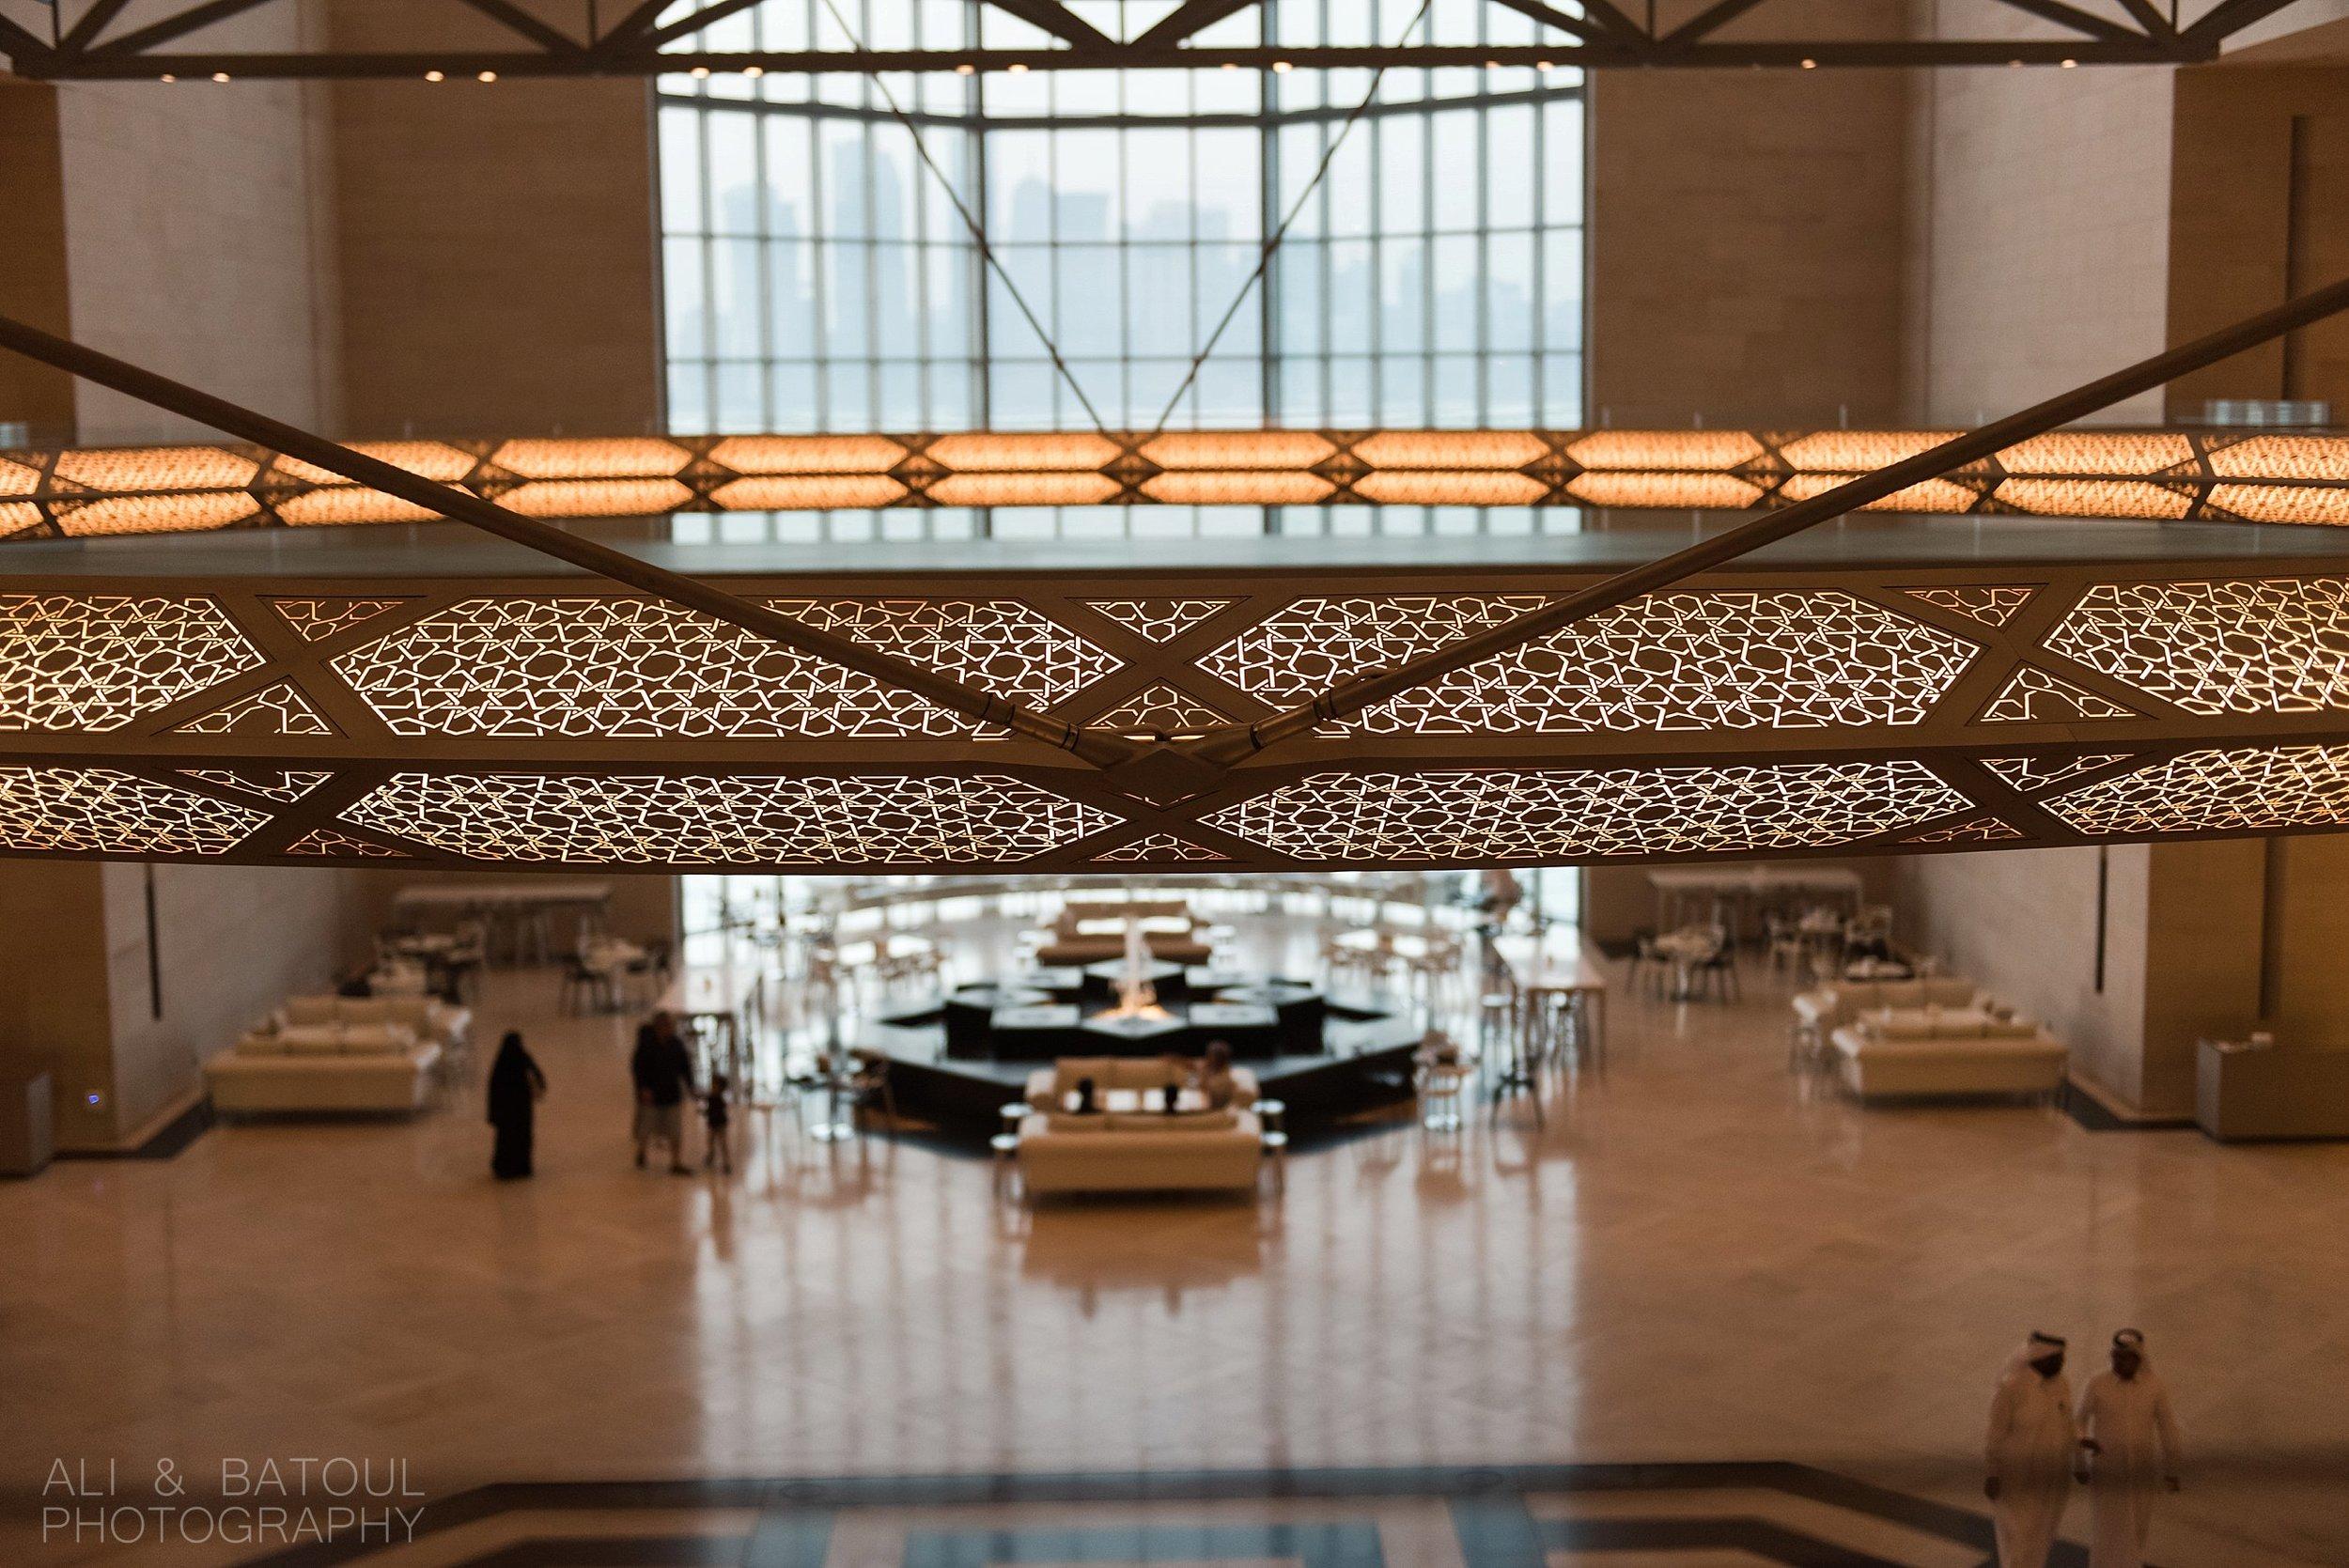 Ali & Batoul Photography - Doha Travel Photography_0008.jpg